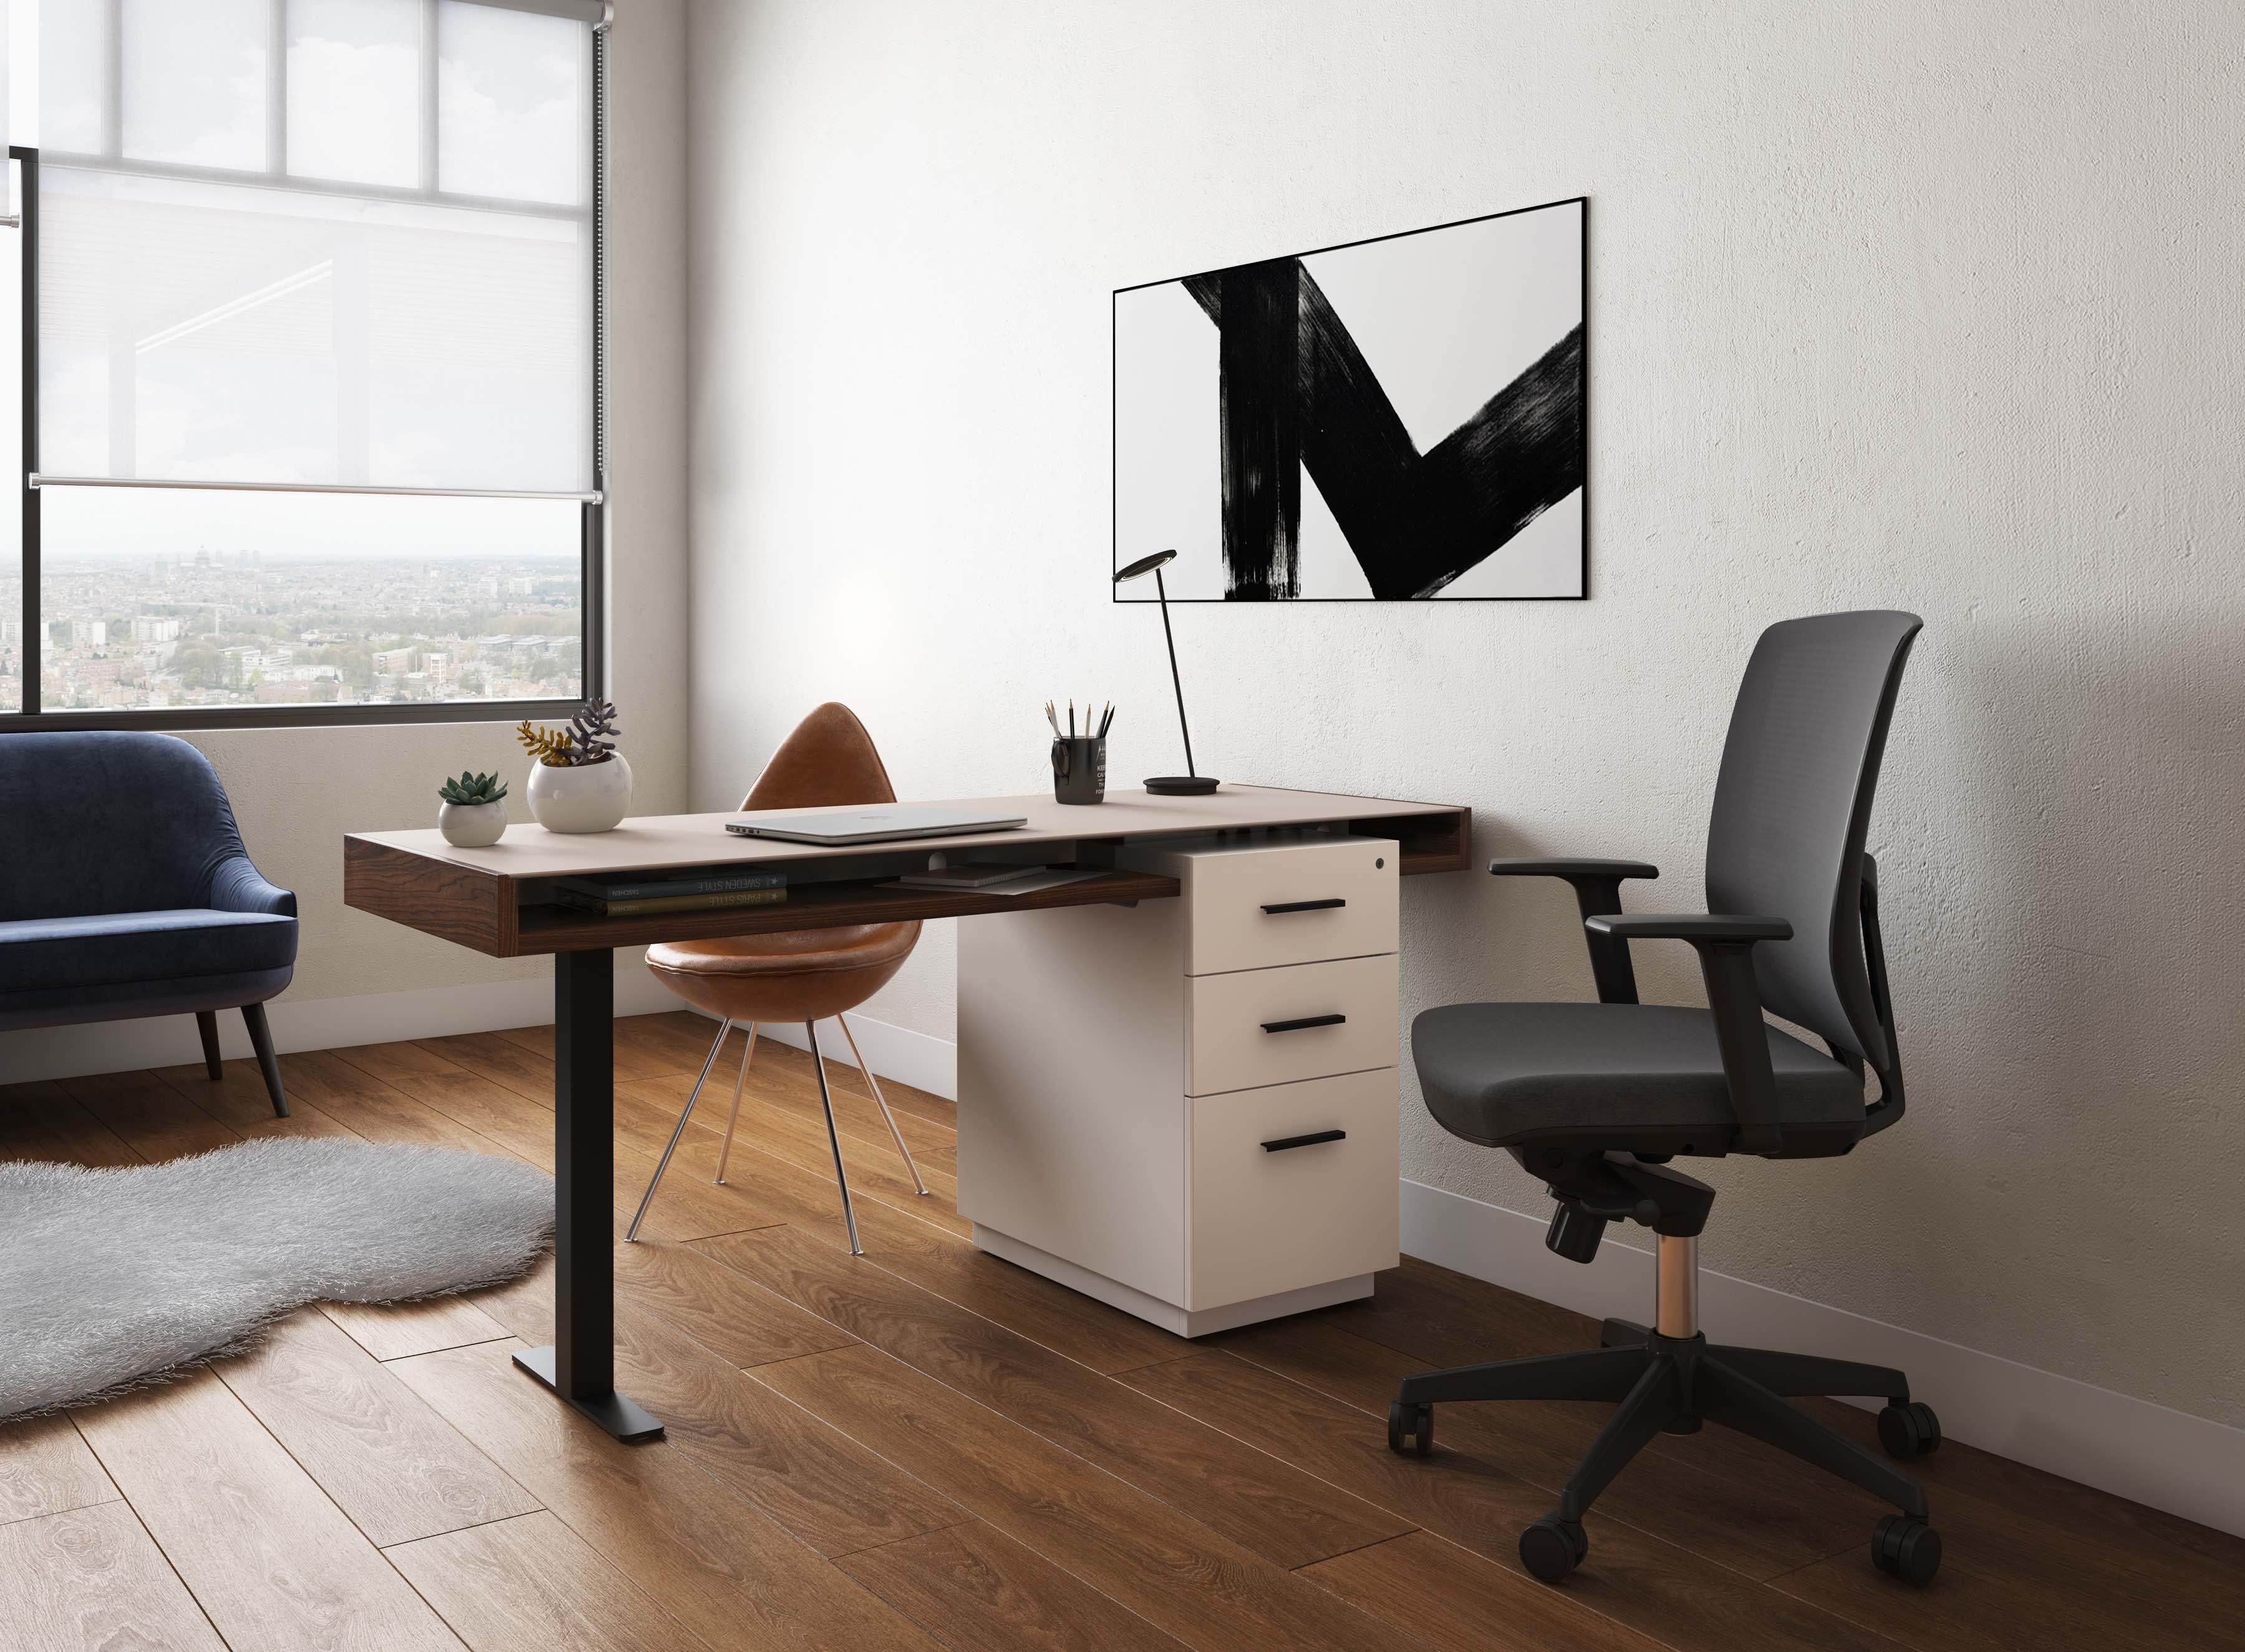 designs bdi modern hero com for walnut bdiusa living furniture cabinet media cupboard toasted innovative octave